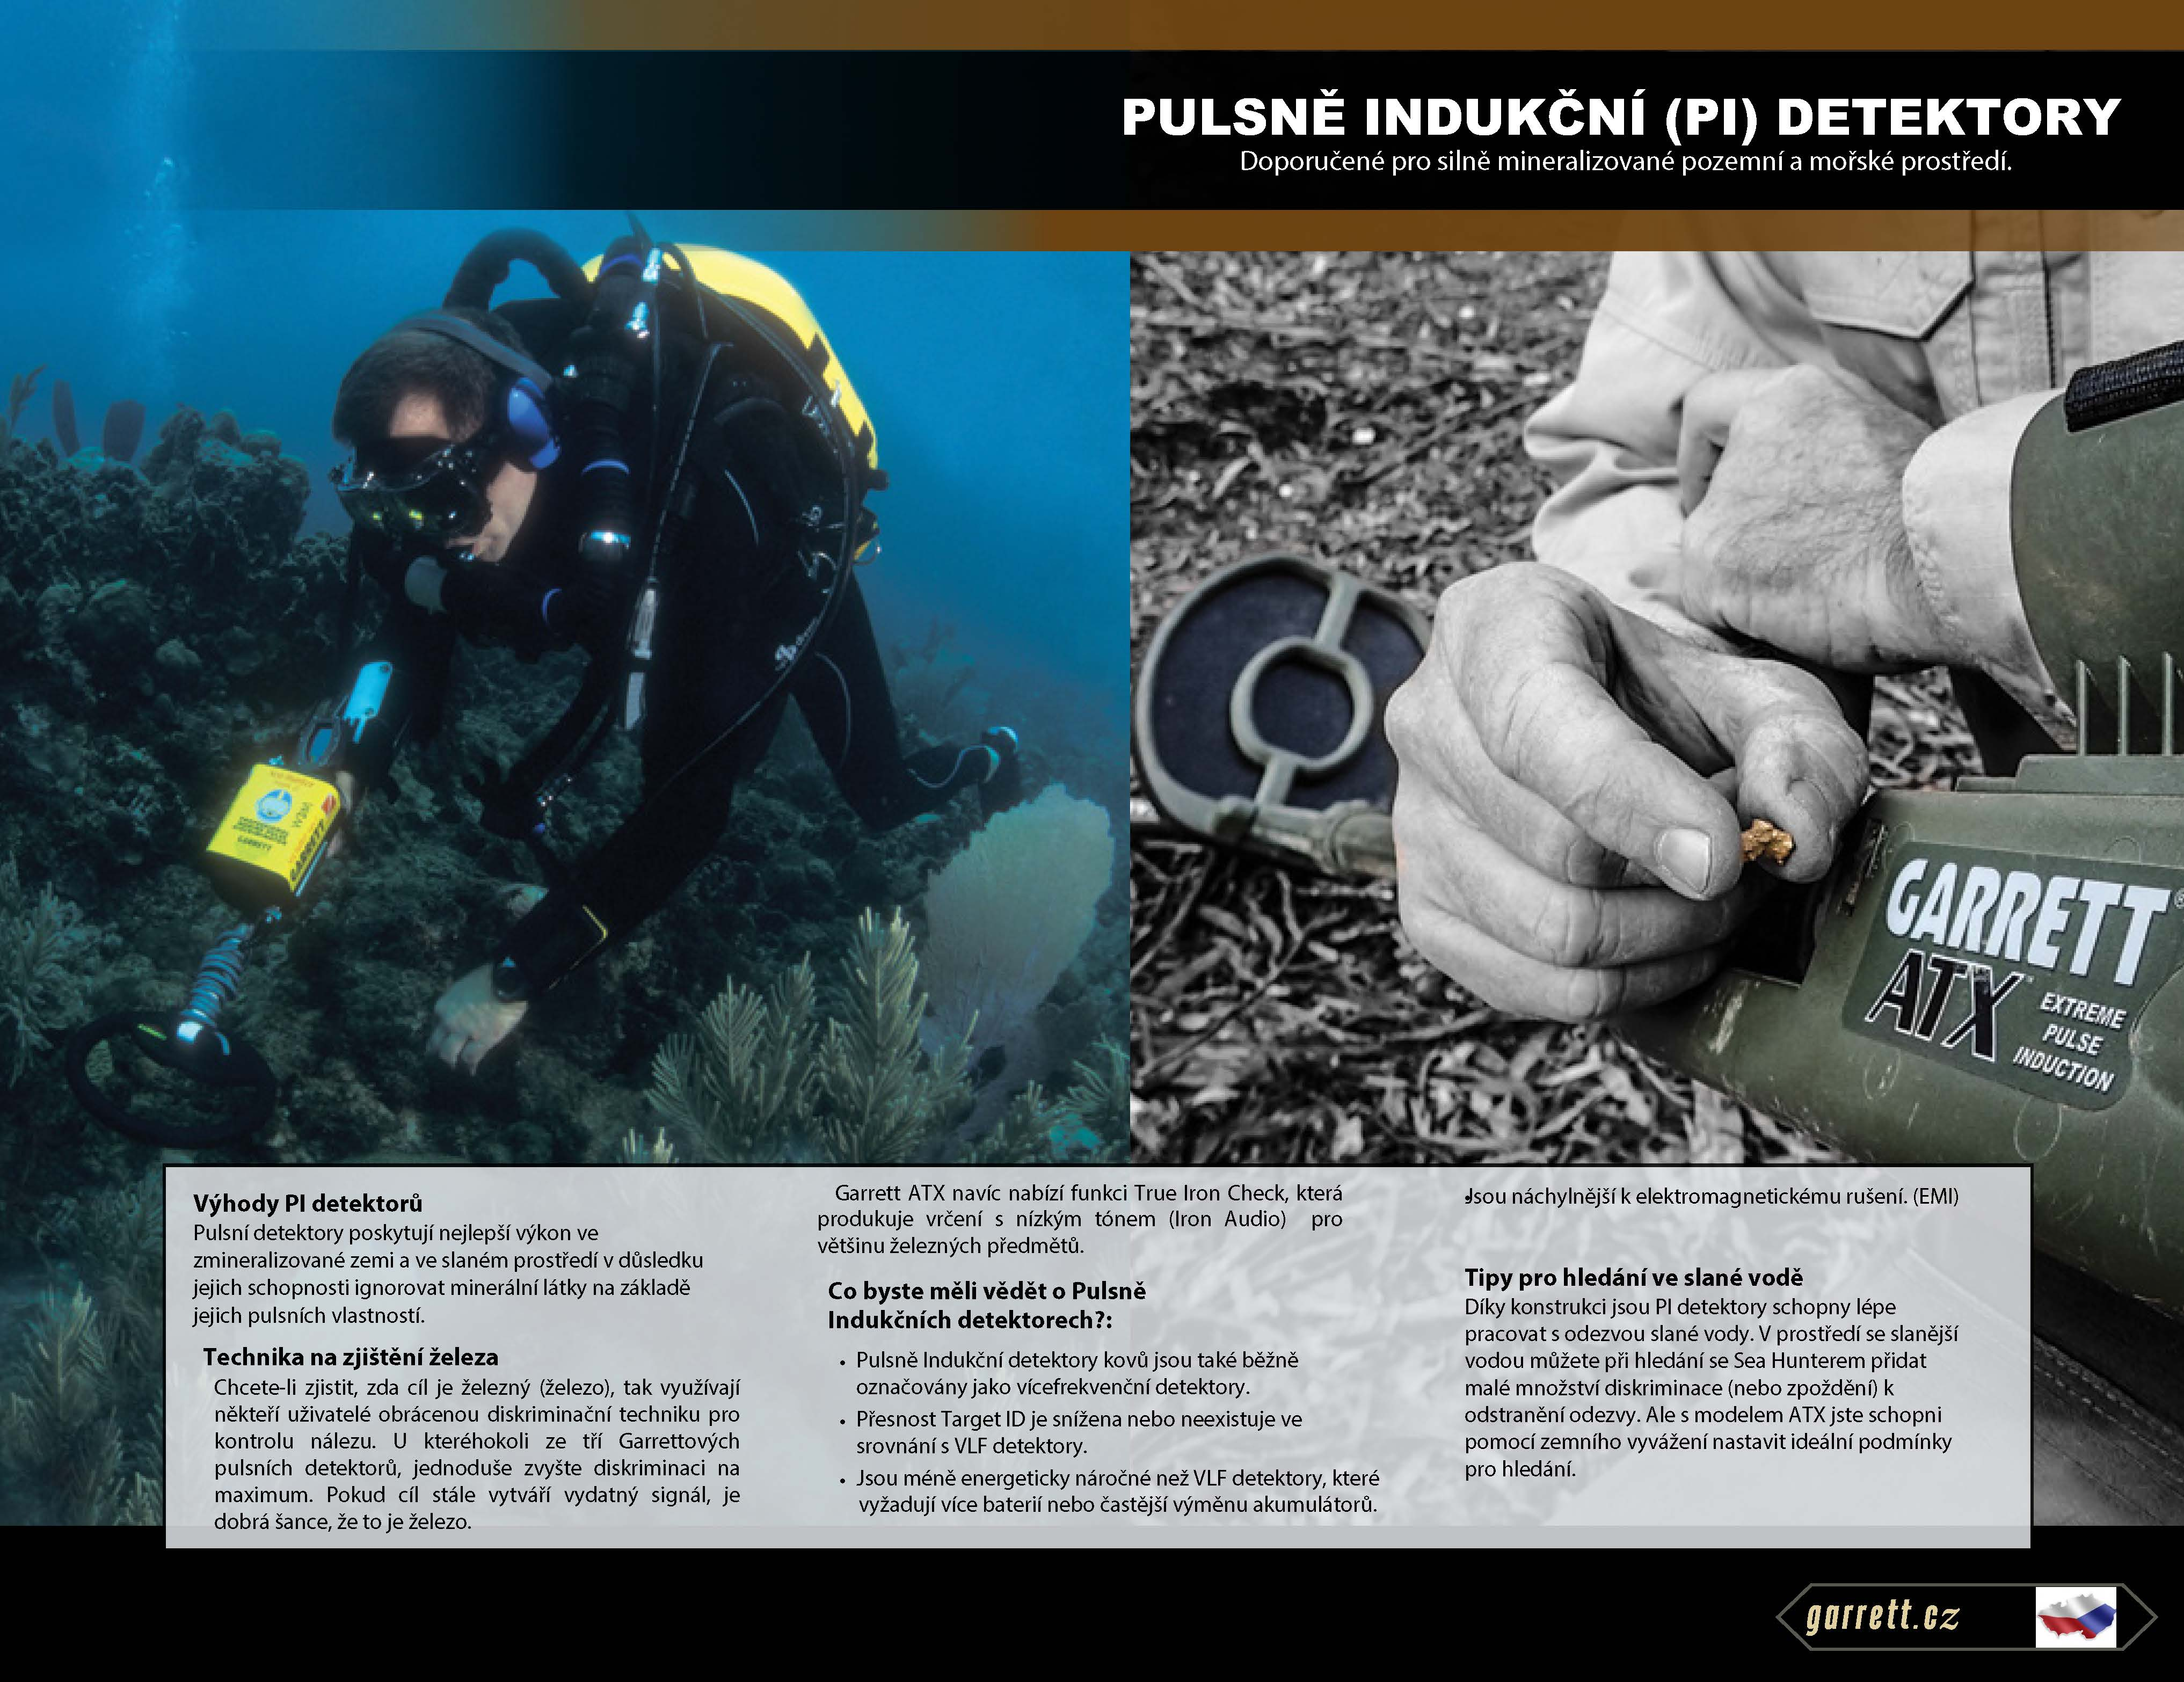 PI detektory